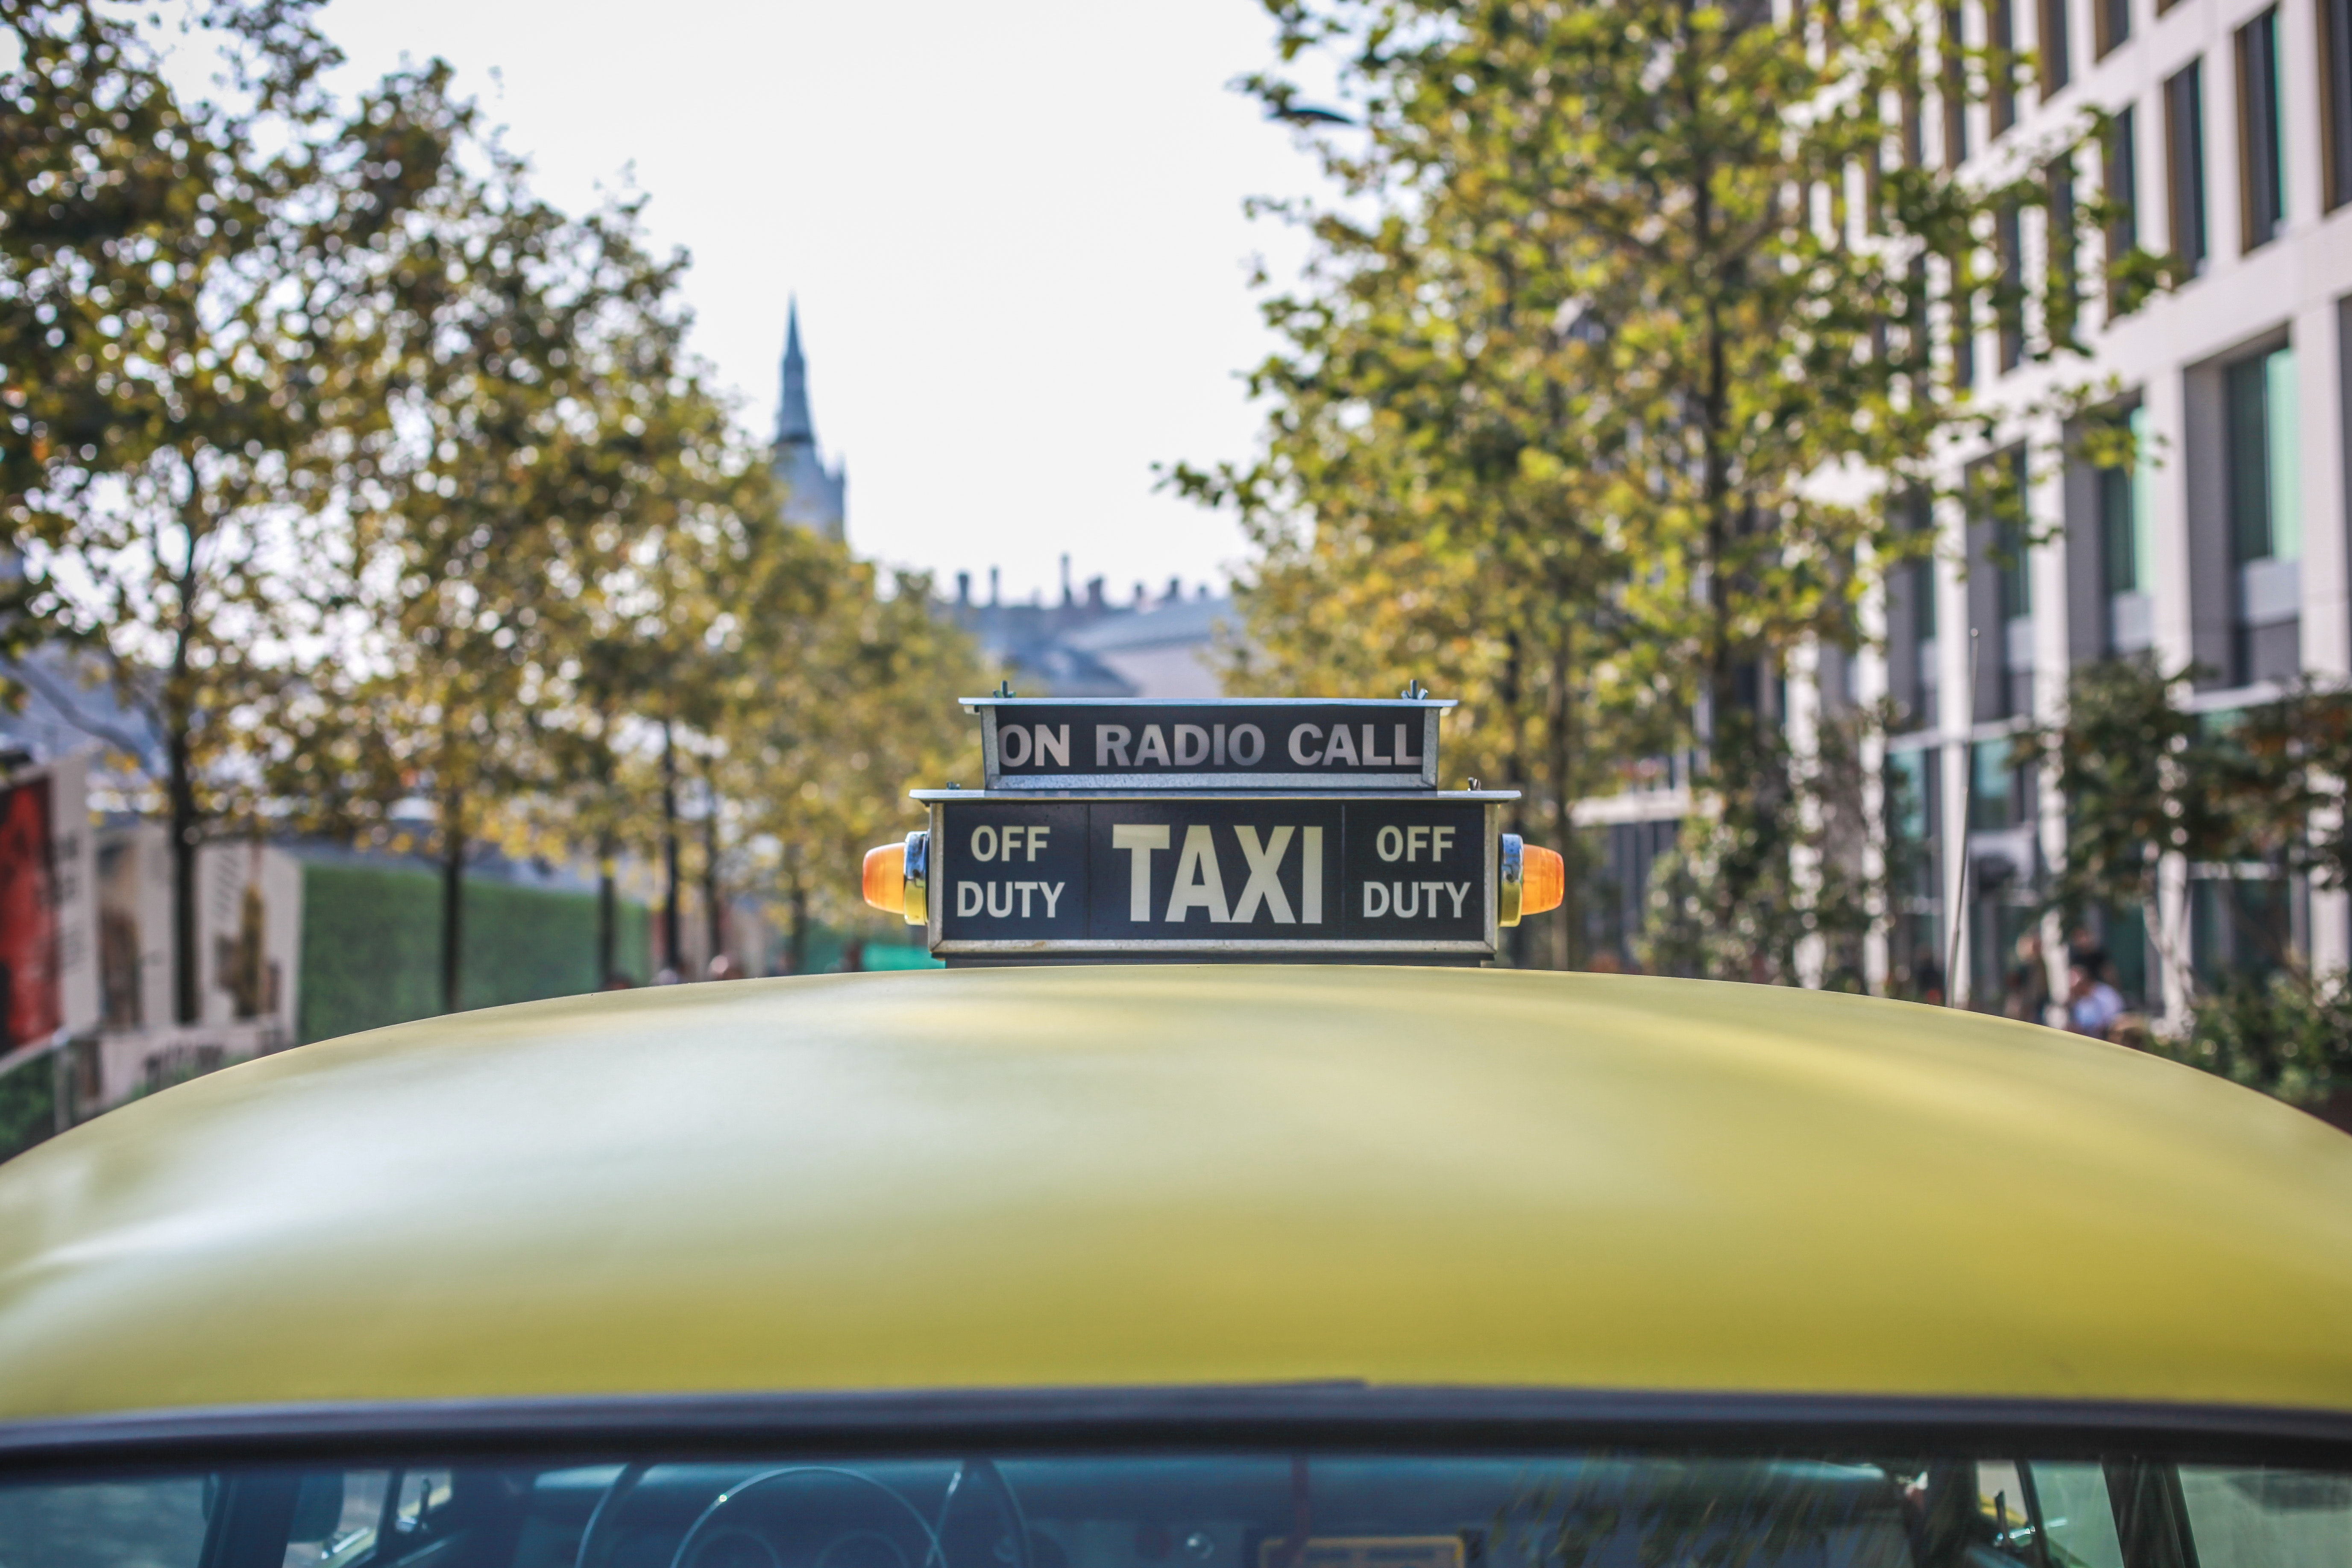 Yellow Taxi Car, Sign, Vehicle, Urban, Trees, HQ Photo